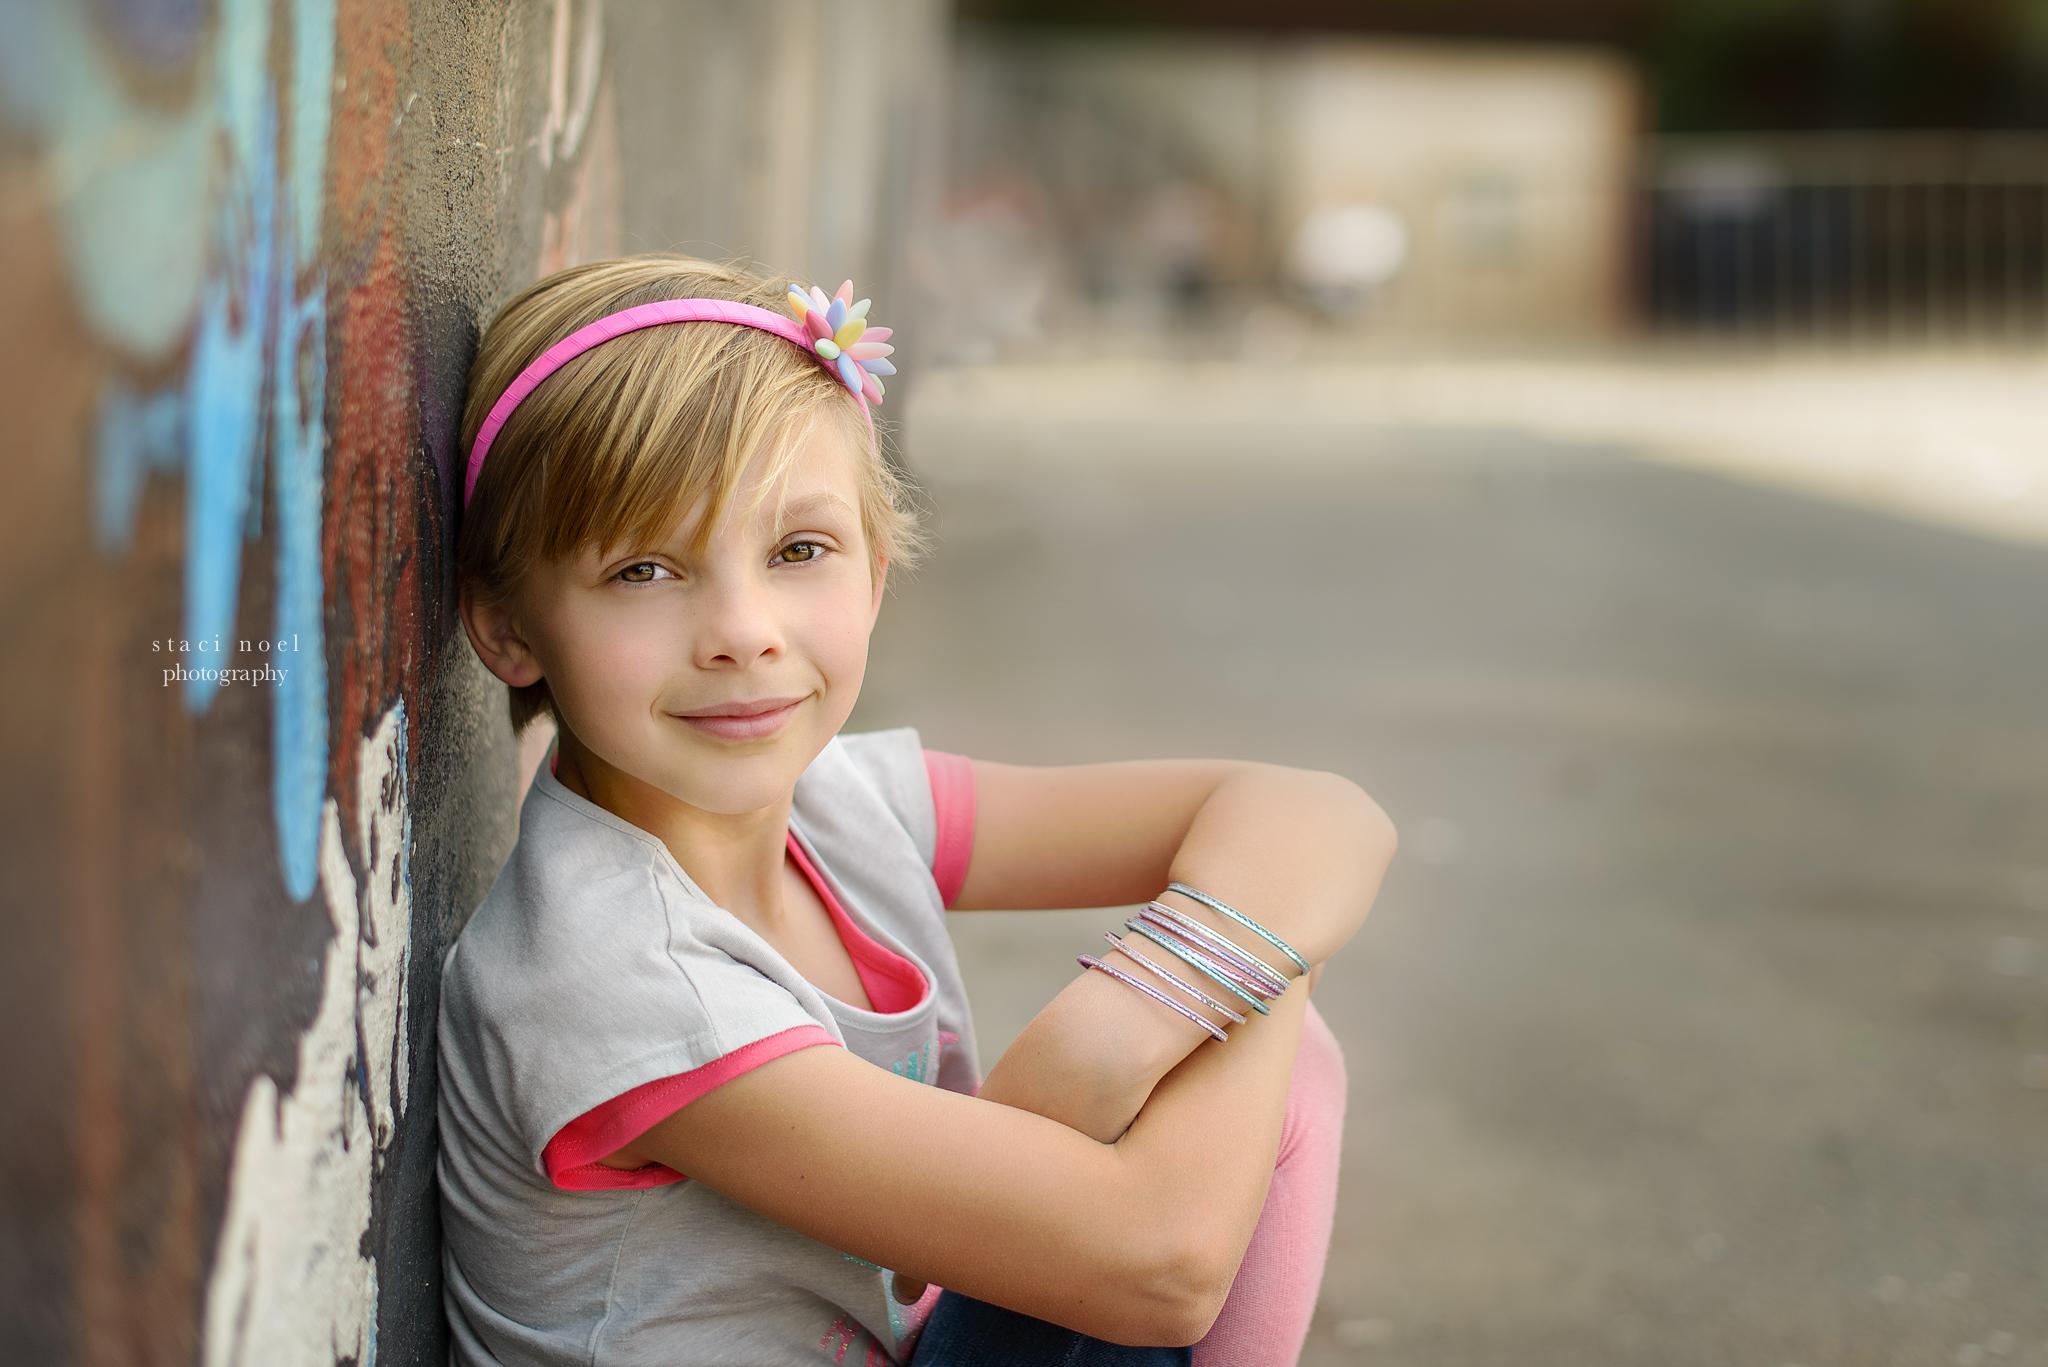 stacinoelphotography.childphotographer.charlotte.2016.1.jpg